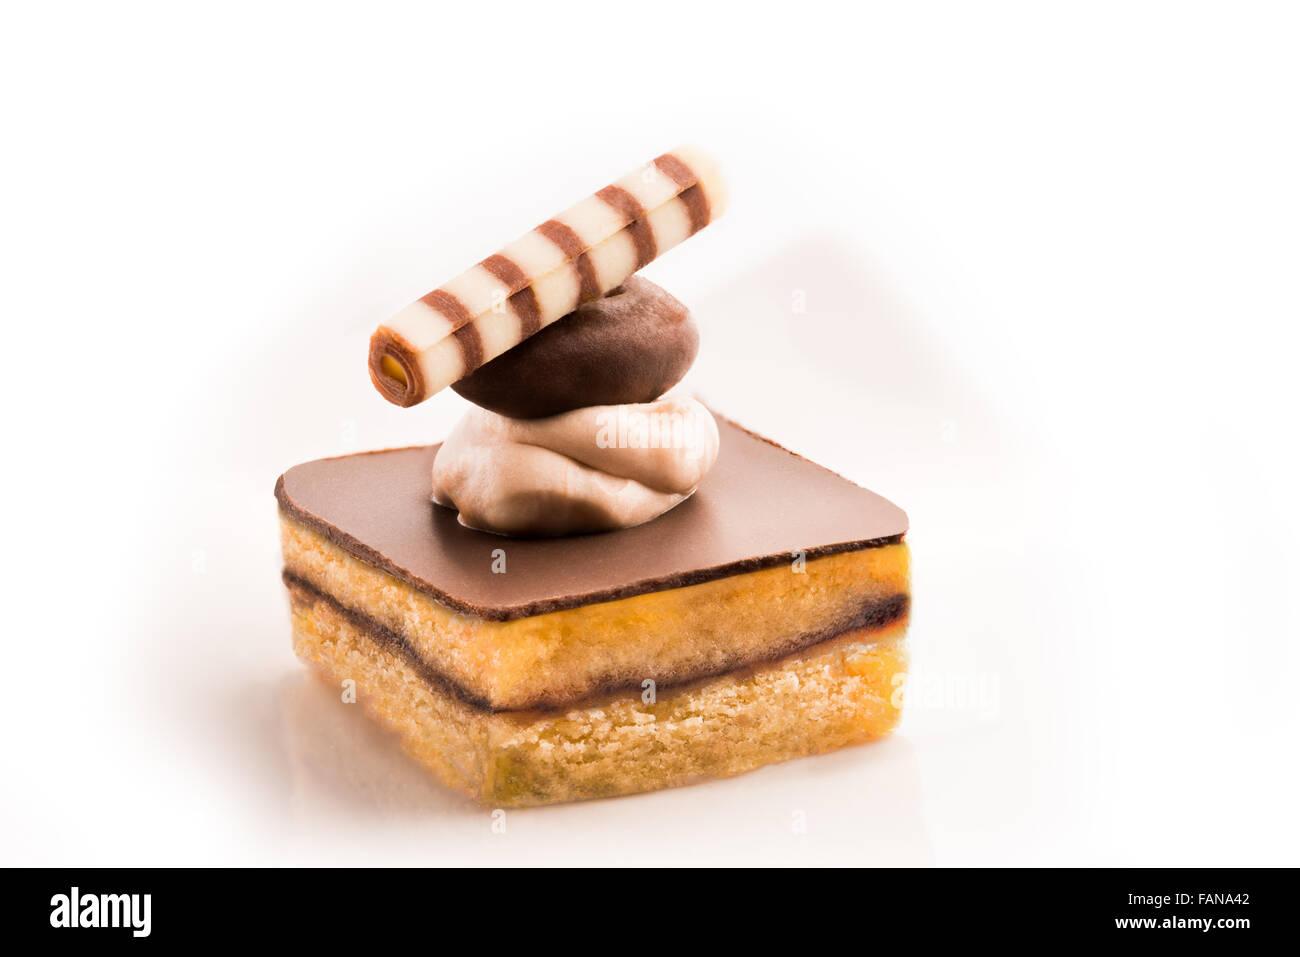 Keks mit üppiger Dekoration, Schokolade, Sahne, Buttercreme, Kuchen, Brötchen, Creme, Haselnussbutter, Stockbild